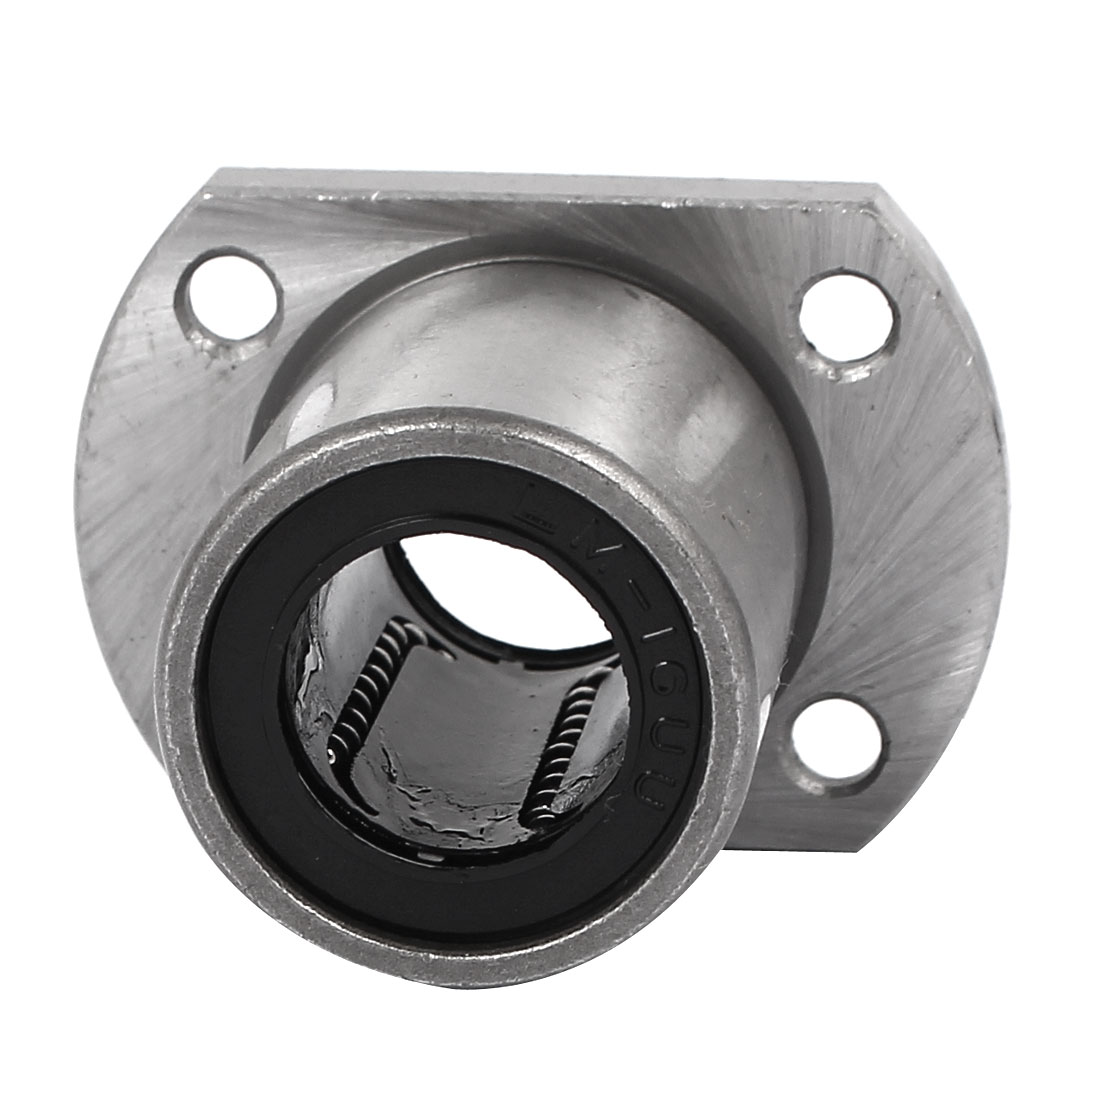 6mm Oval Flange Mounted Linear Motion Bushing Ball Bearing